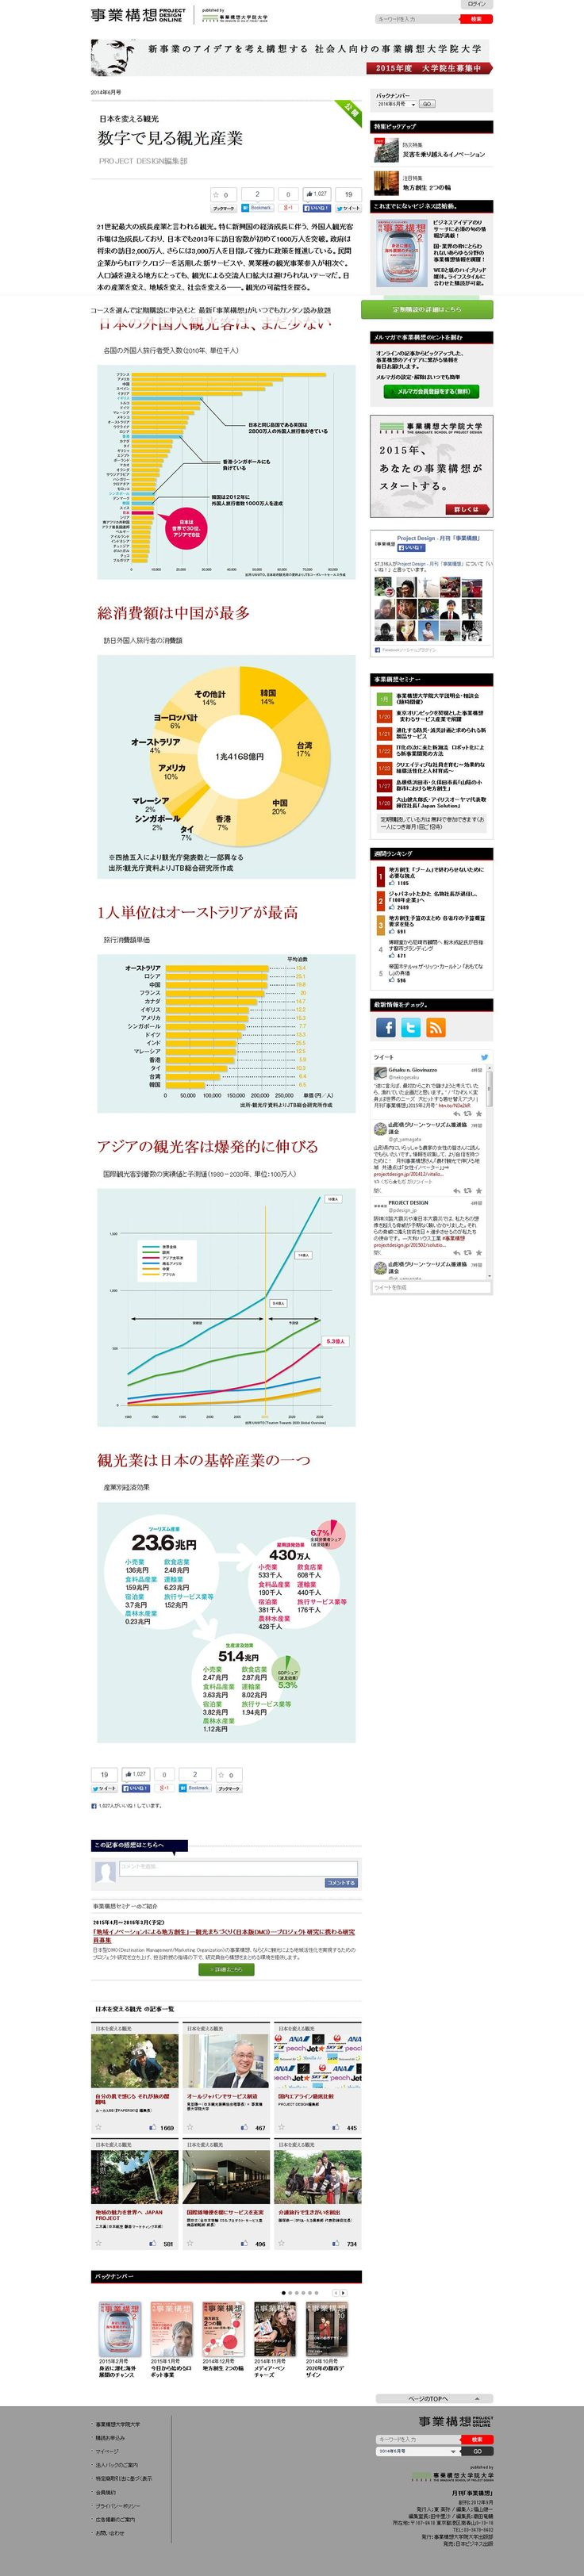 数字で見る観光産業 | 月刊「事業構想」2014年6月号